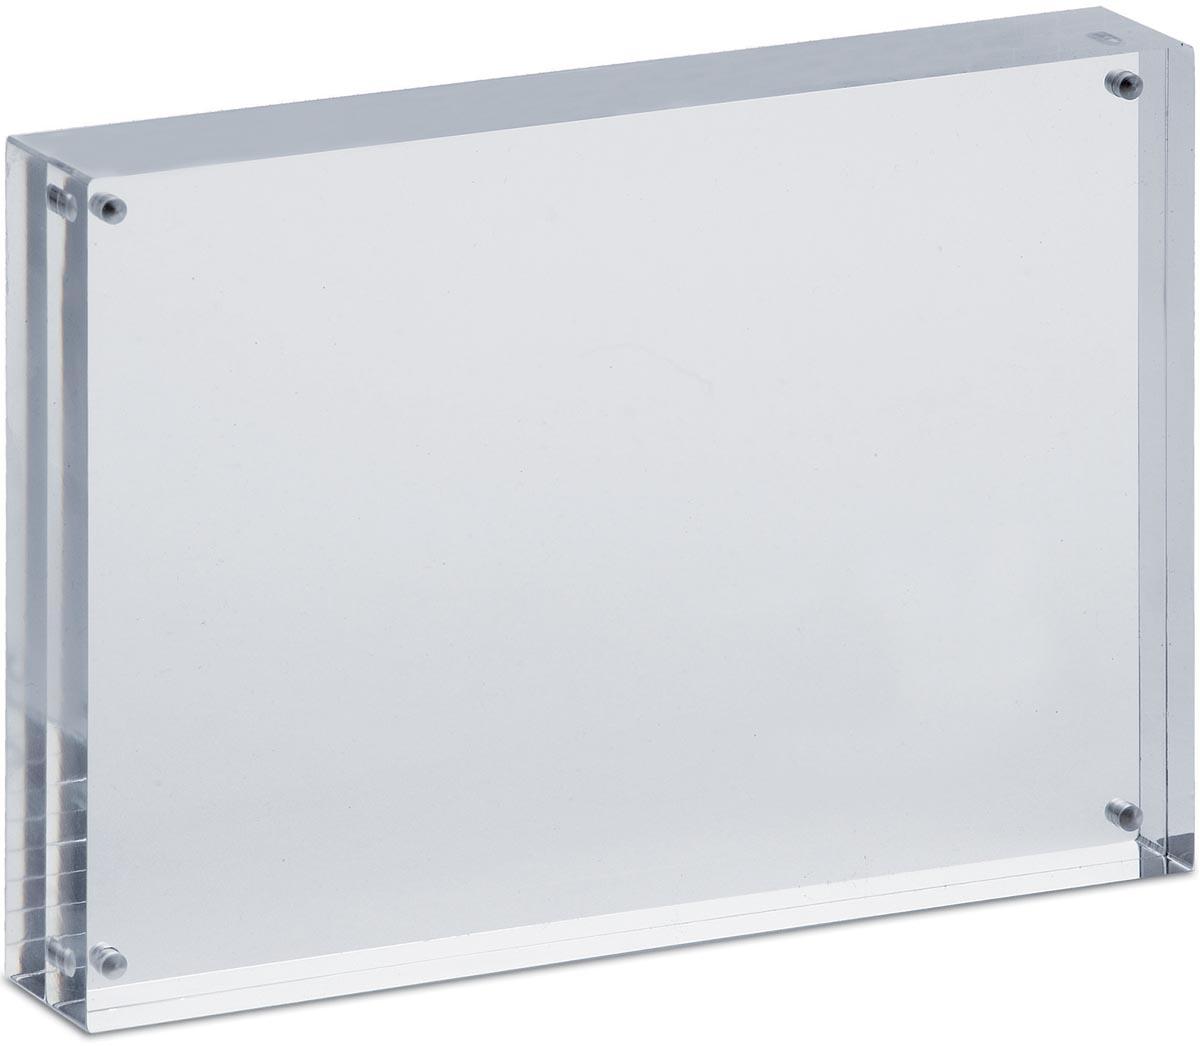 Fotolijst Maul 12.7x17.8x3cm acryl glashelder